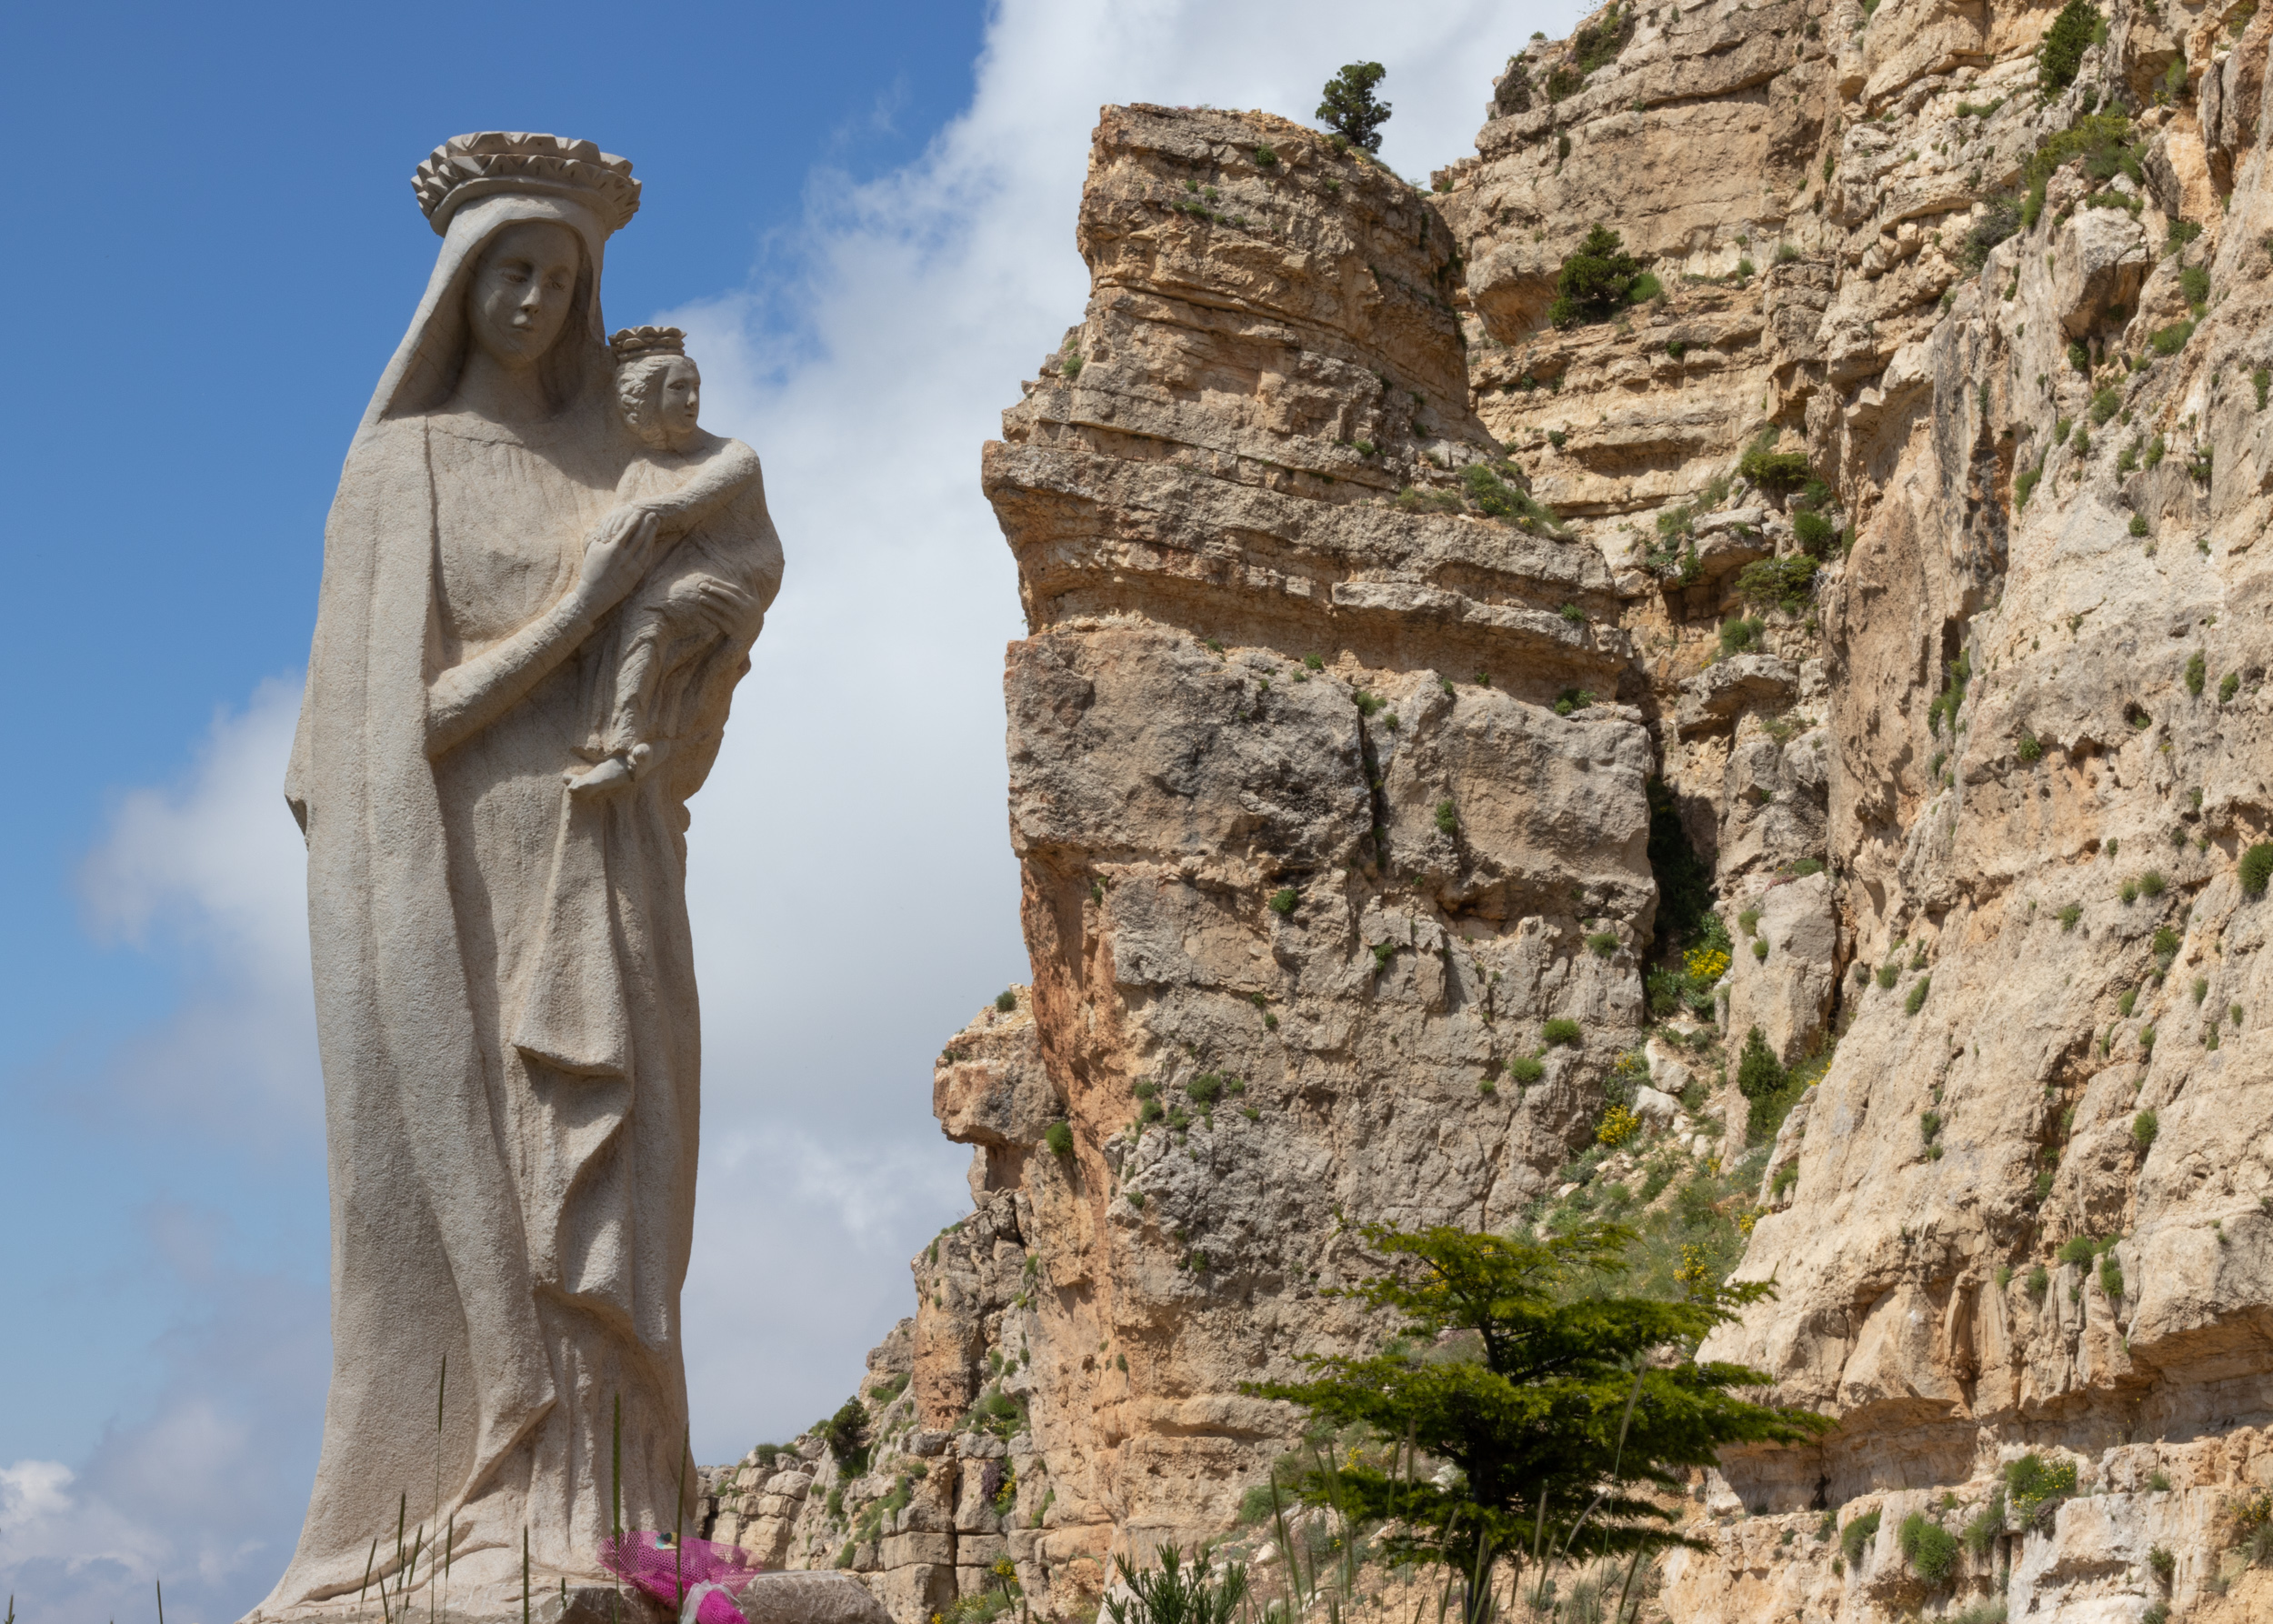 Saydet El Arn Statue